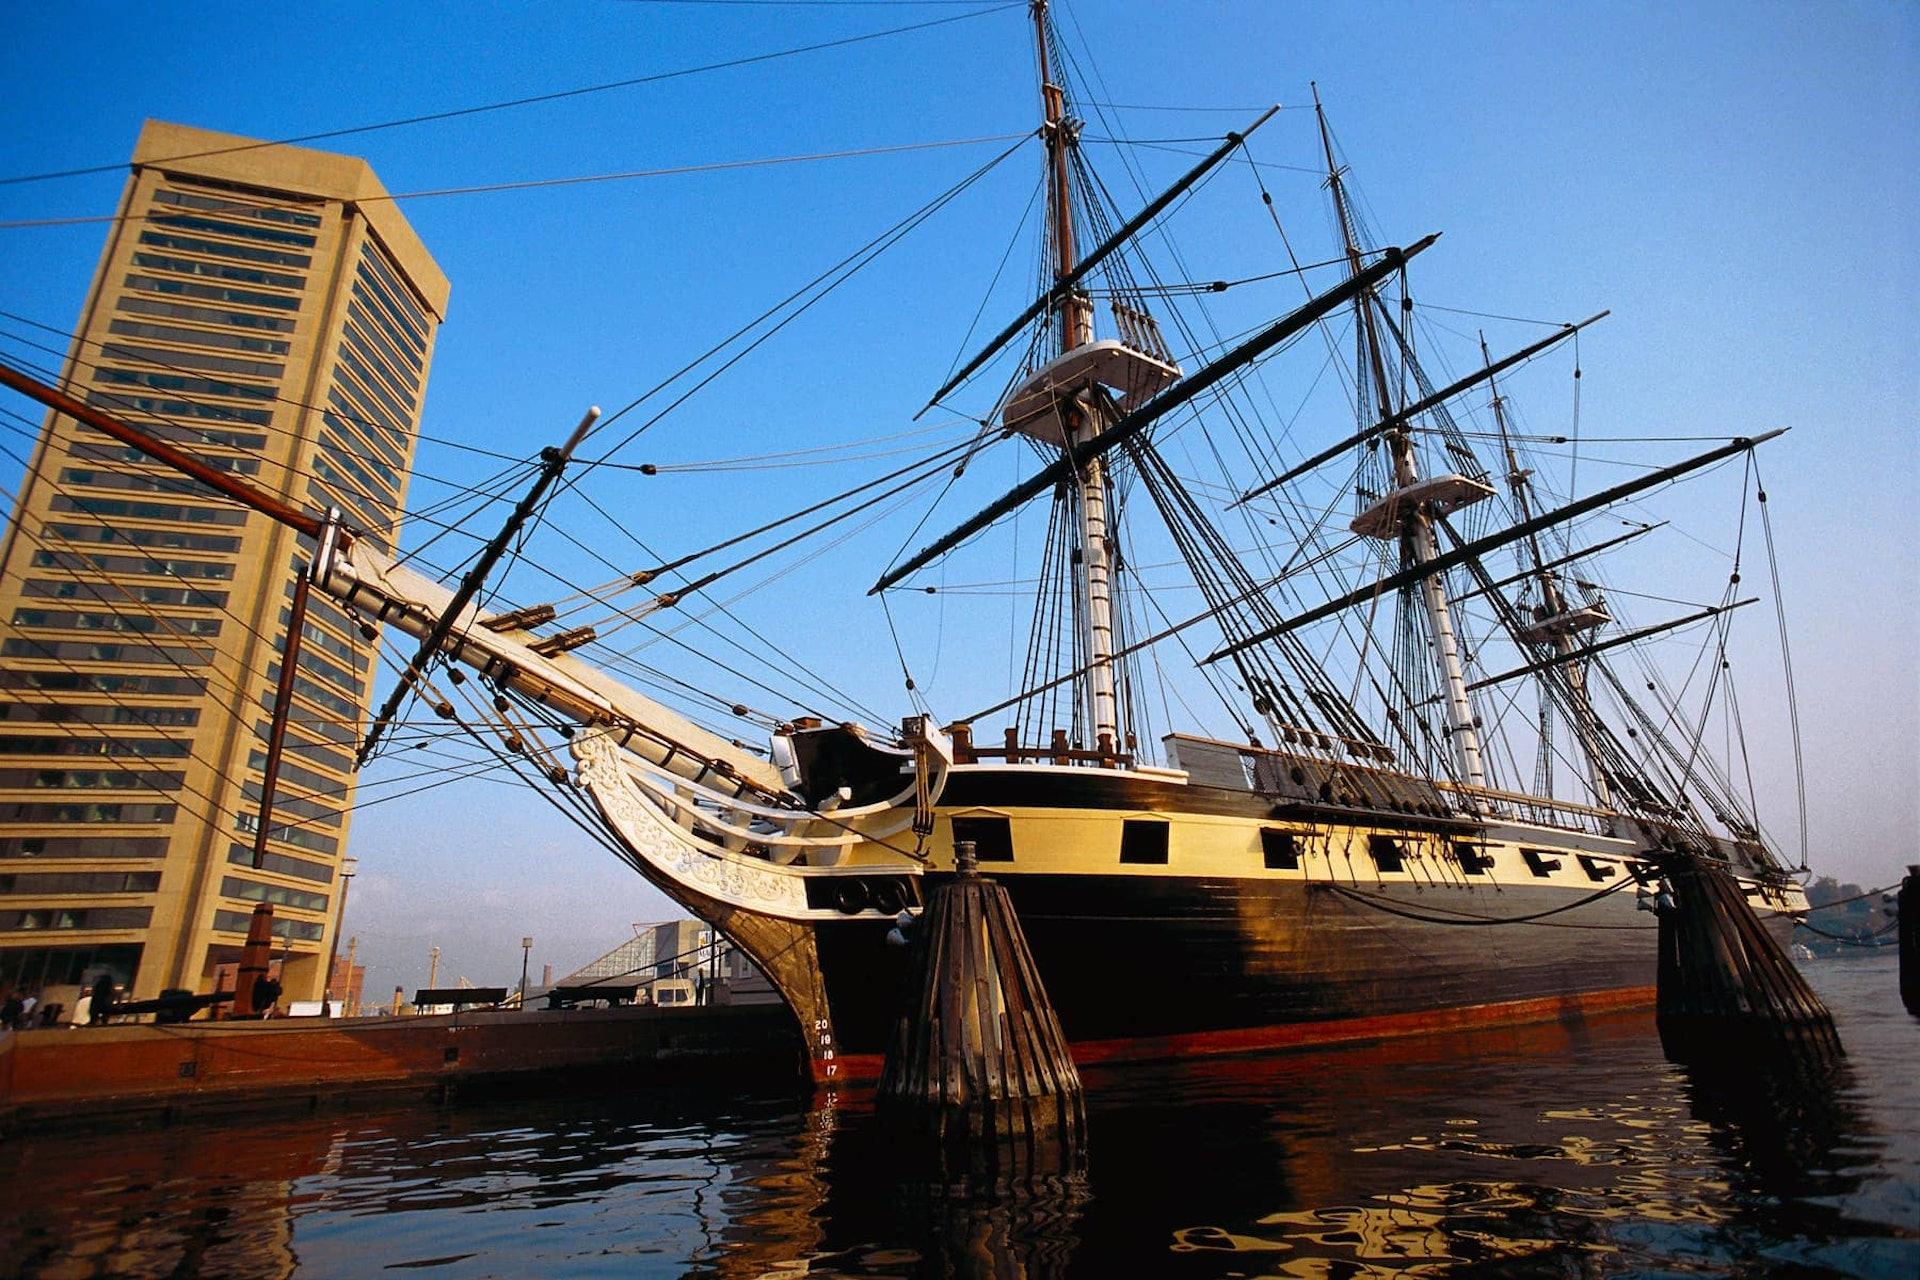 Large ship in Boston Harbor, Boston